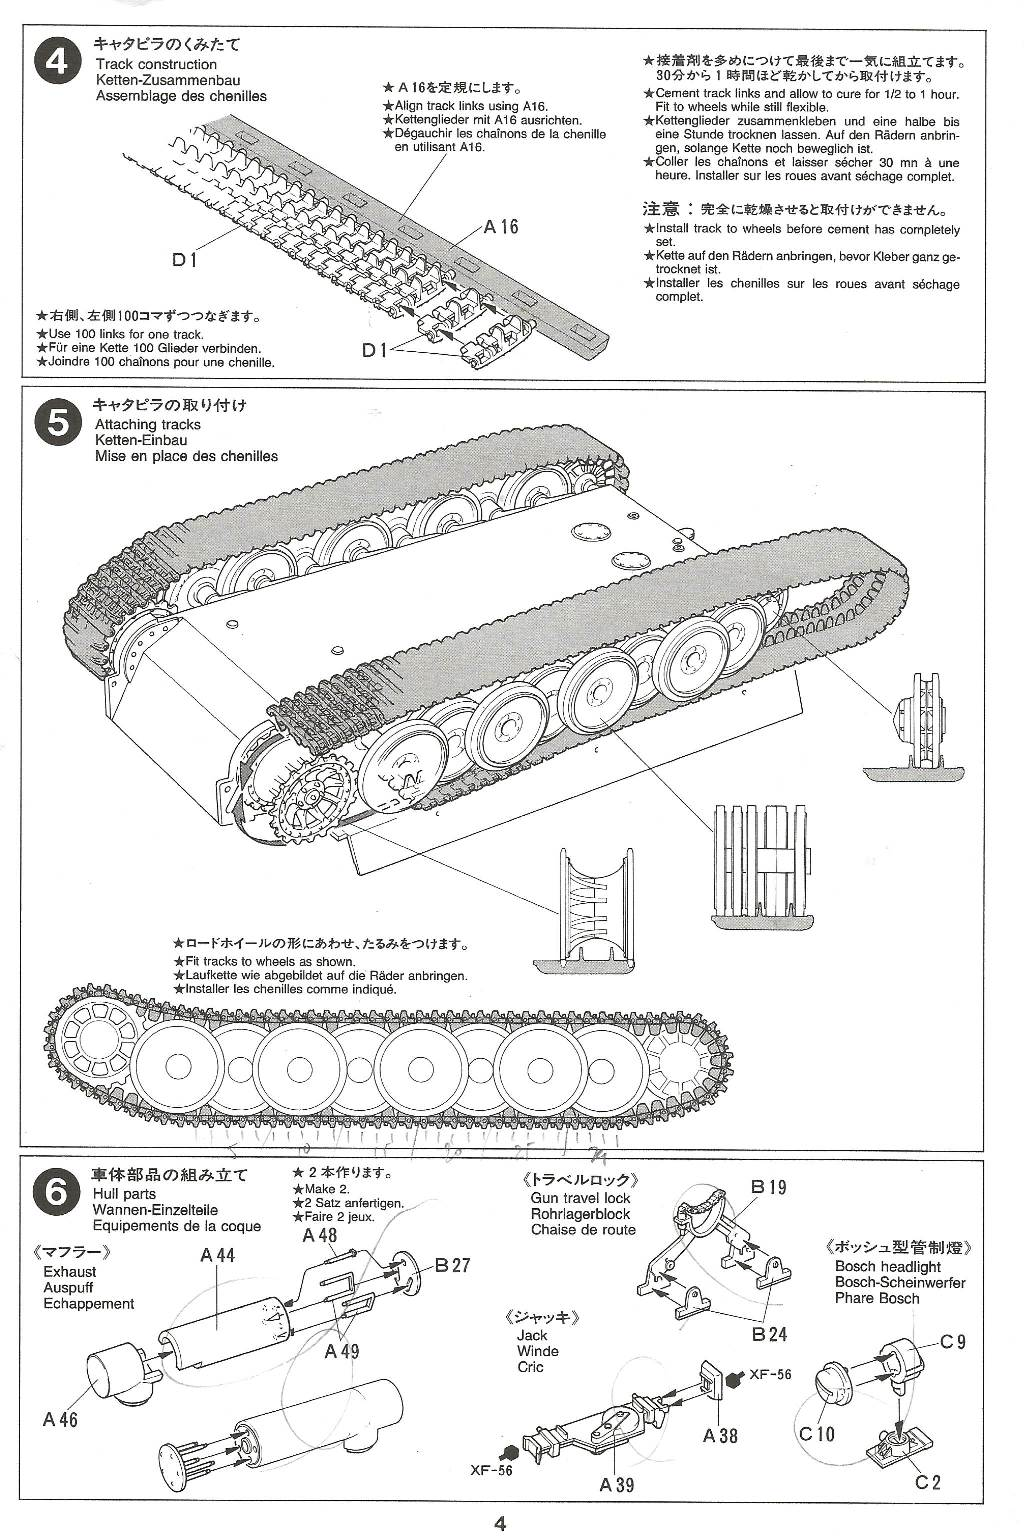 [Tamiya 1/35]  Tiger I mid production réf. 35194 Tigremid-plan-4